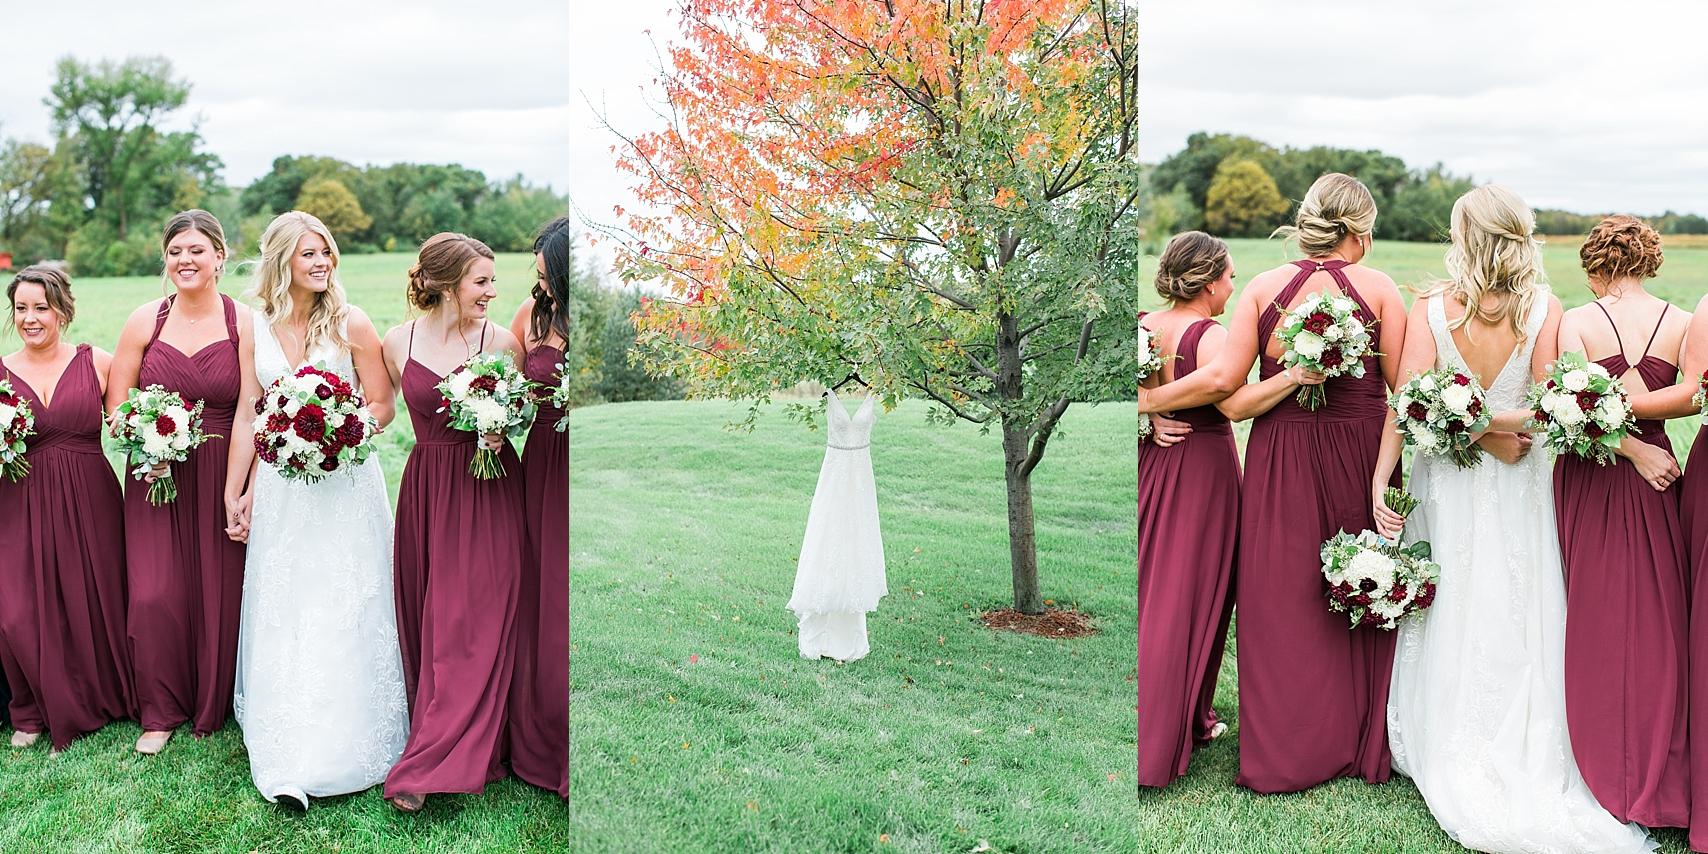 Minnesota Minneapolis Wedding Photographer Best Of 2018 Weddings Mallory Kiesow Photography_0187.jpg